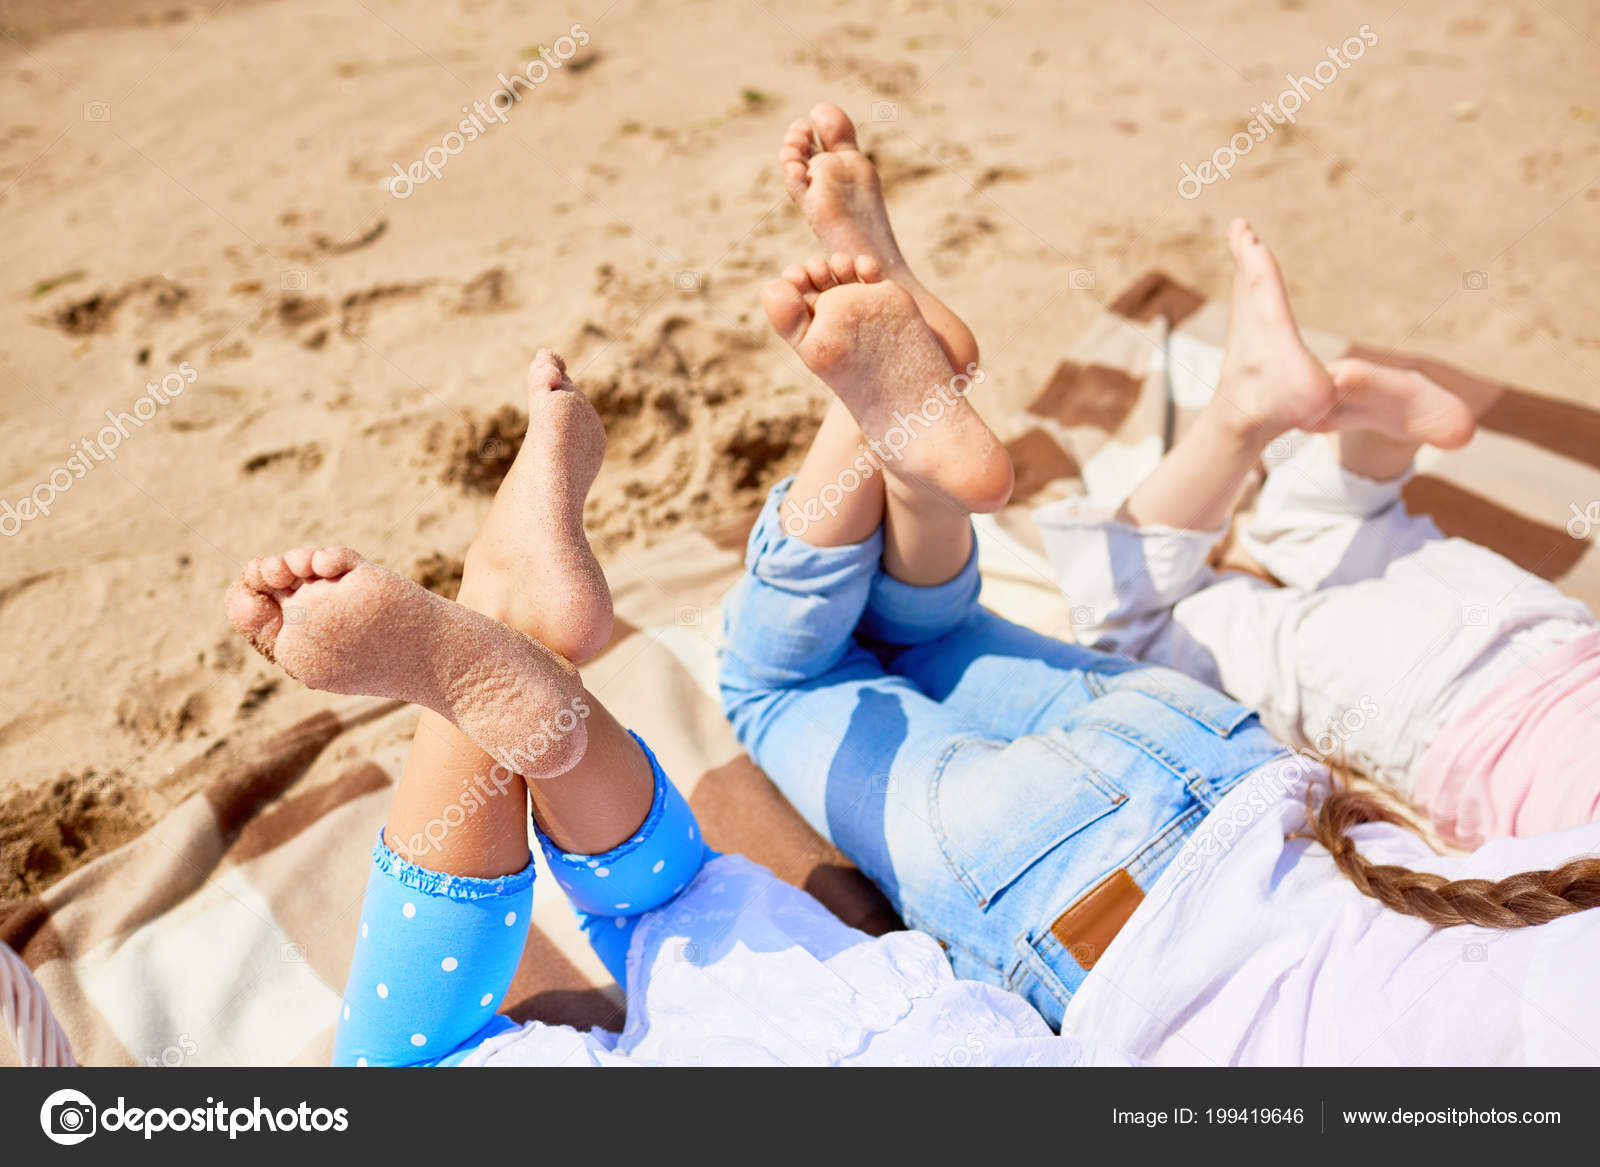 Soles Bare Feet Girls Lying Sandy Beach Hot Summer Day Stock Photo